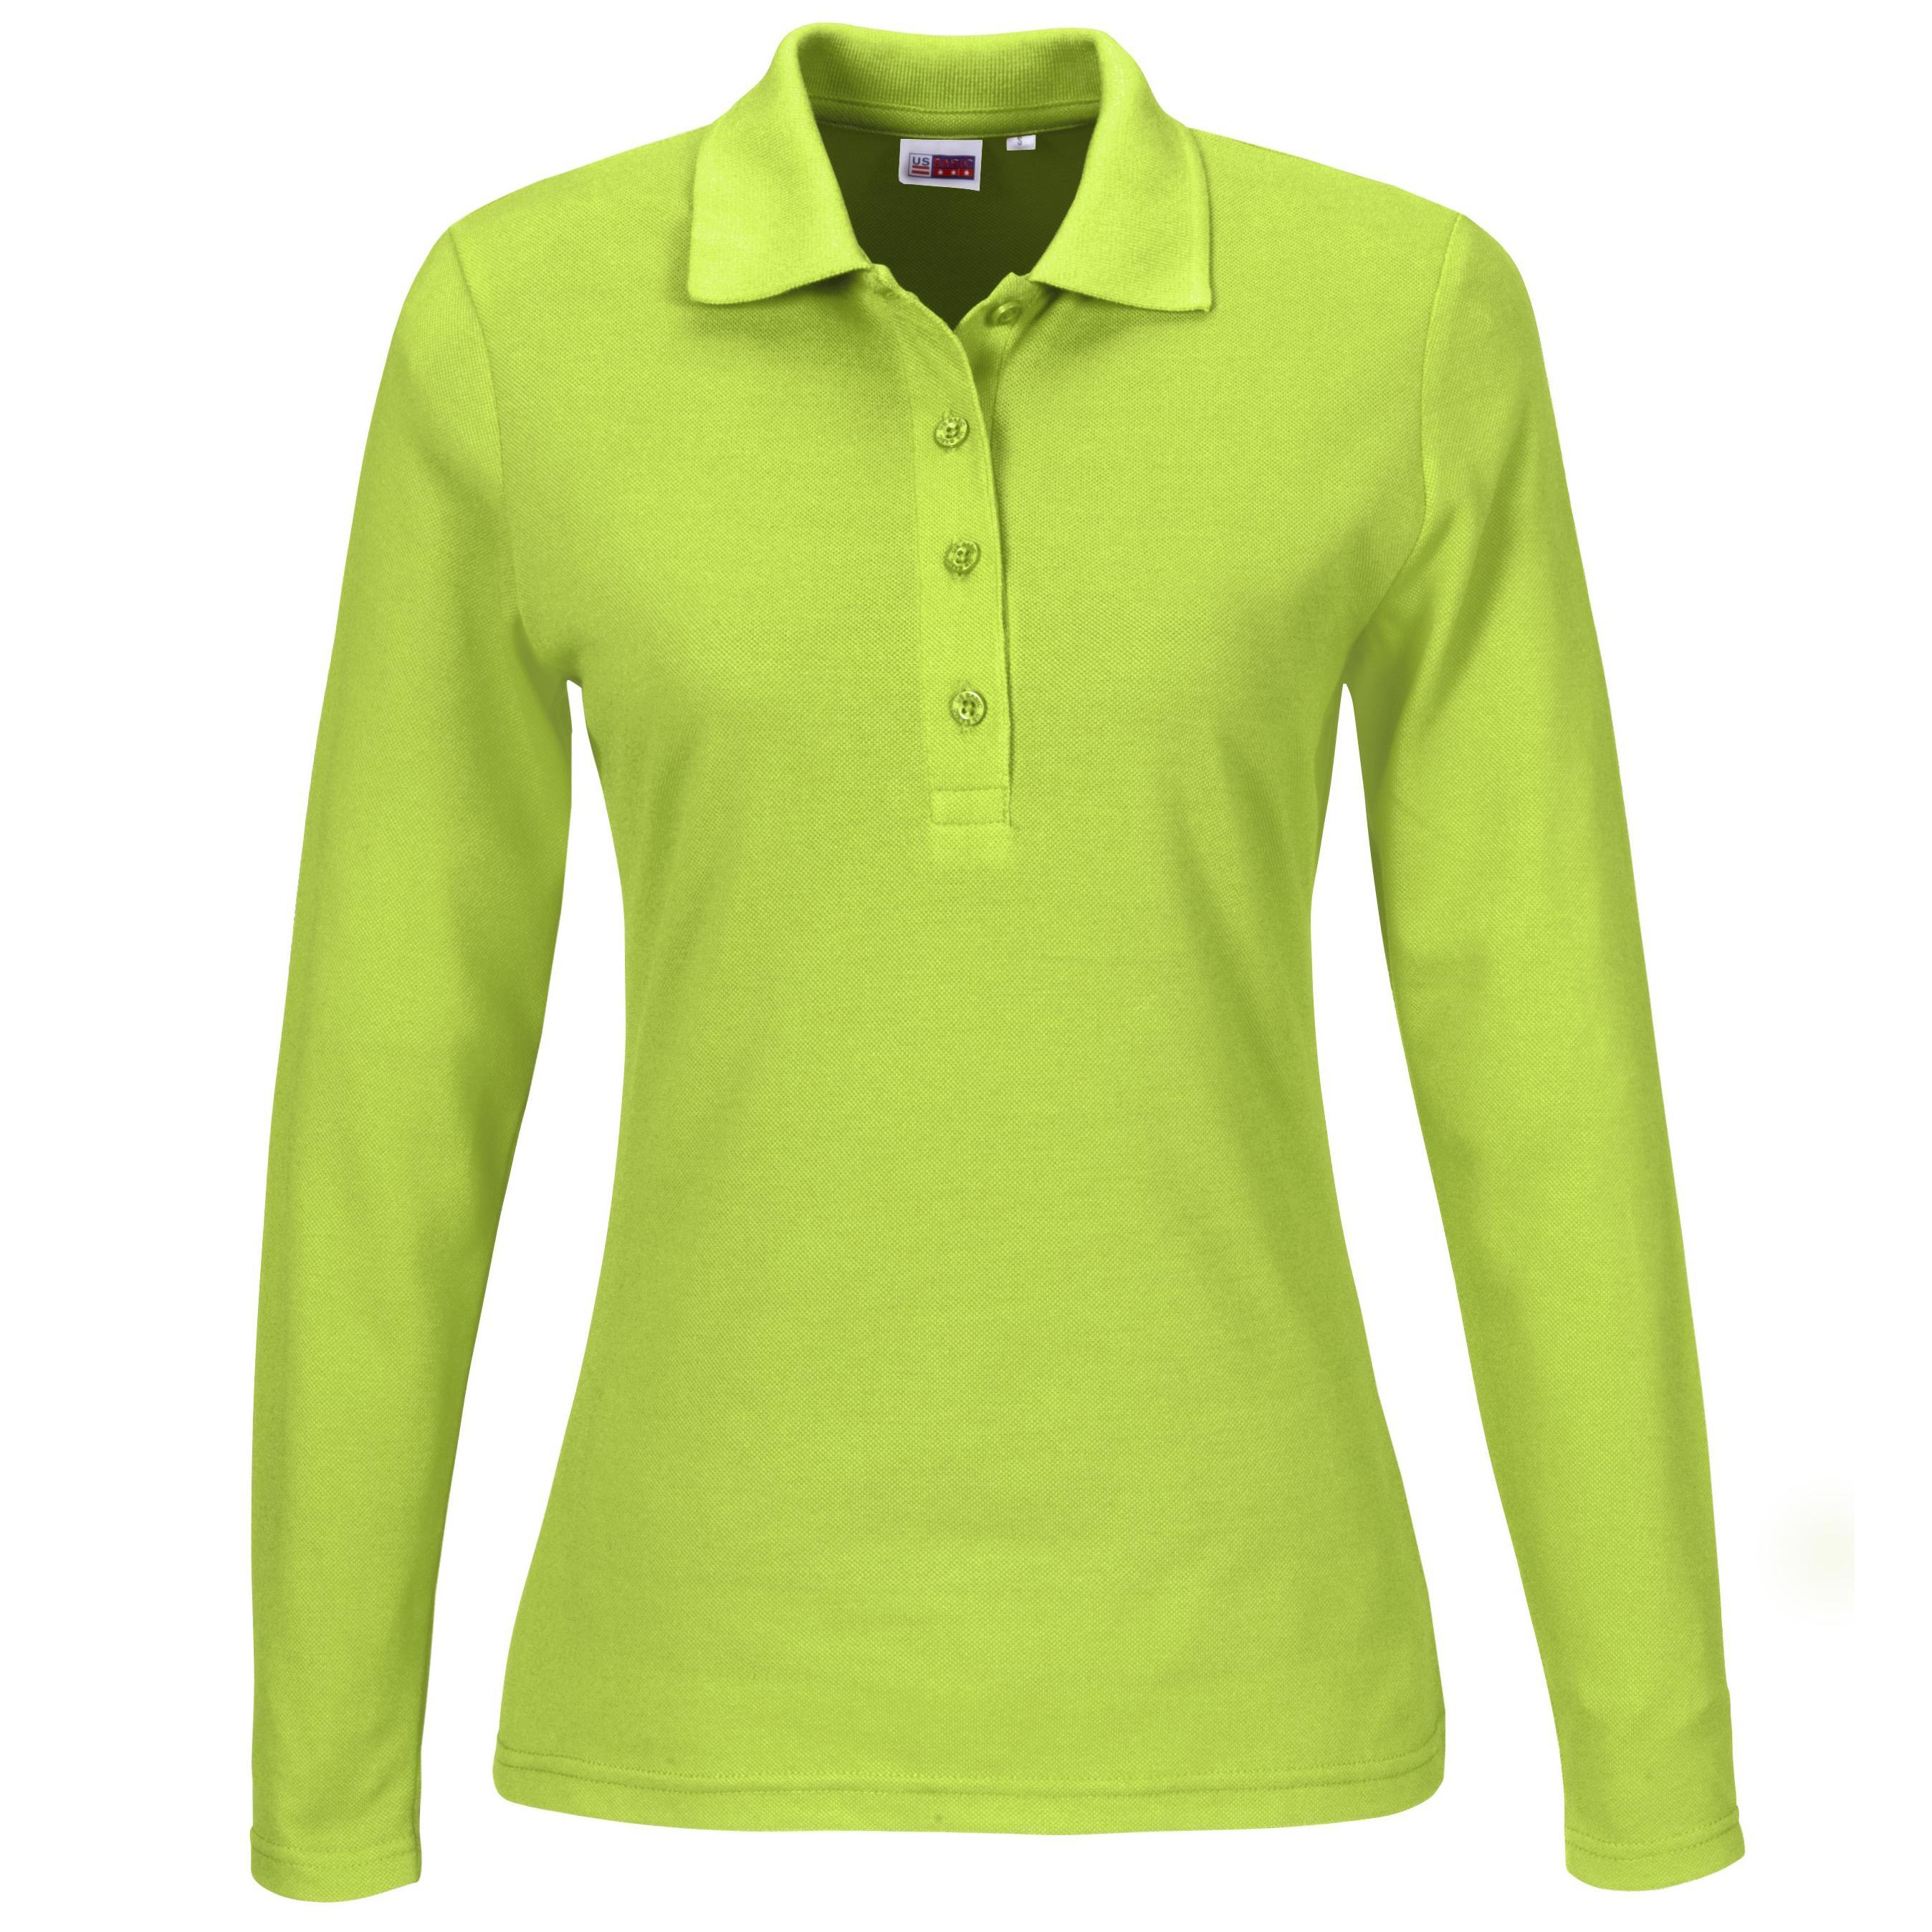 Ladies Long Sleeve Elemental Golf Shirt - Lime Only